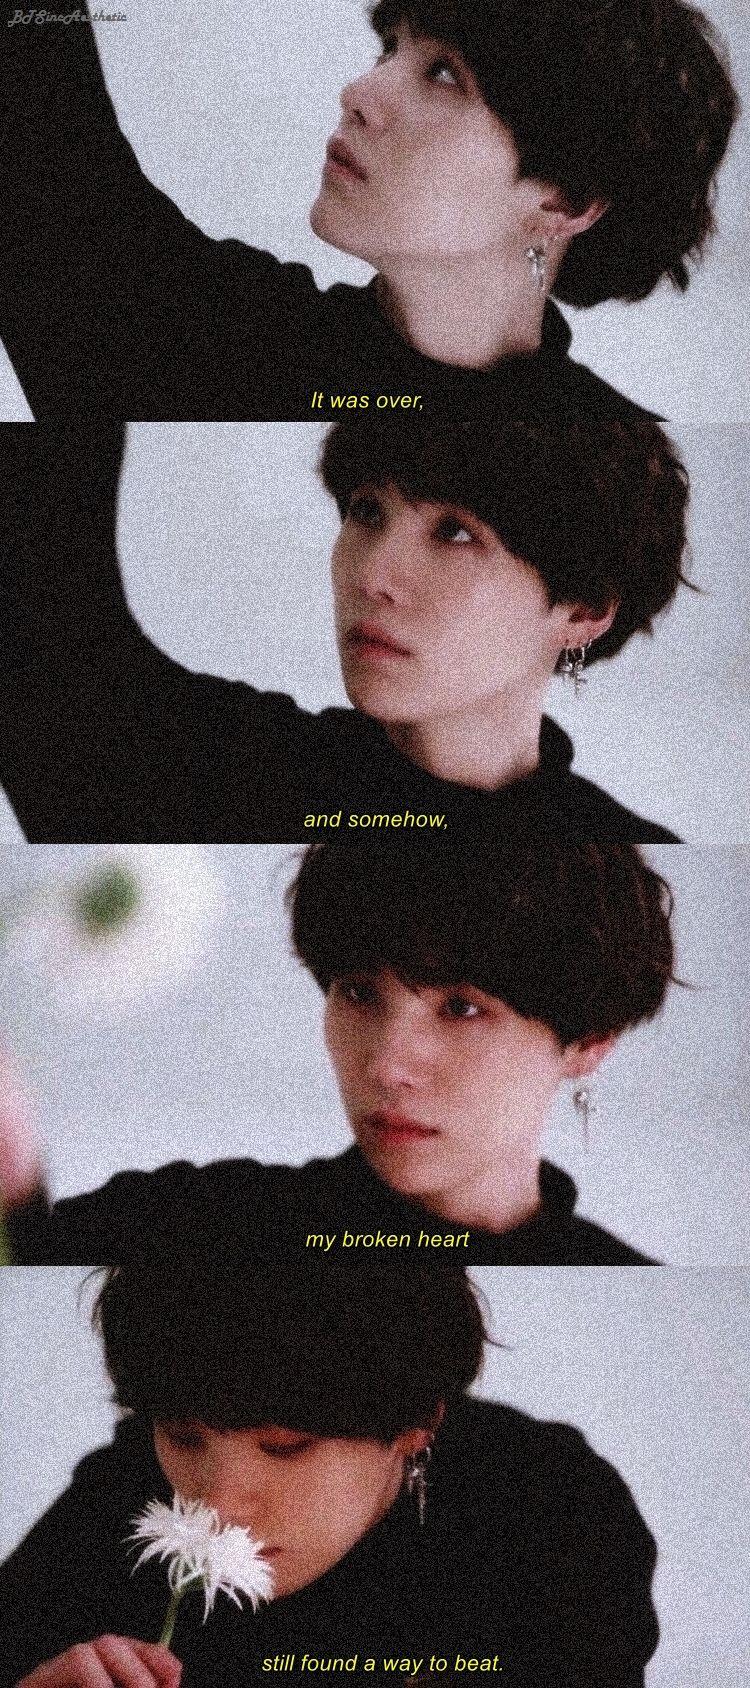 #quotes #mood #aesthetic #subtitles #movies #scenes #seokjin #jin #YOONGI #SUGA #NAMJOON #RM #hoseok #JHOPE #jimin #taehyung #jinaesthetic